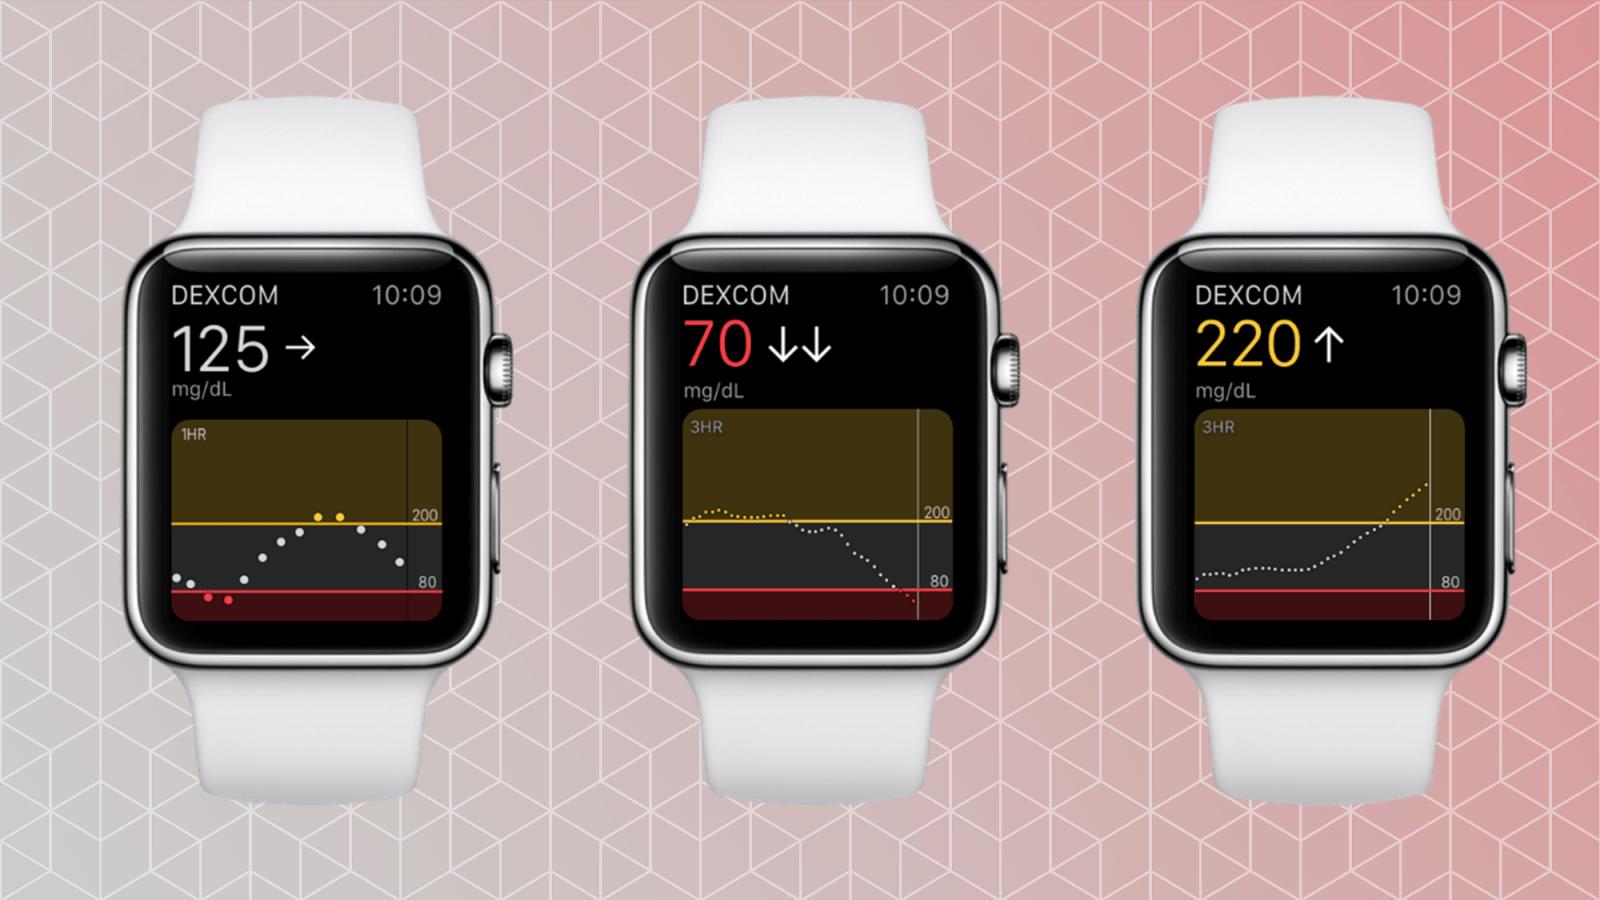 Galaxy Watch 3 и Apple Watch 7 могут получить функцию измерения сахара в крови (qlrmeefb2vsxr6bsudh9xc 1)